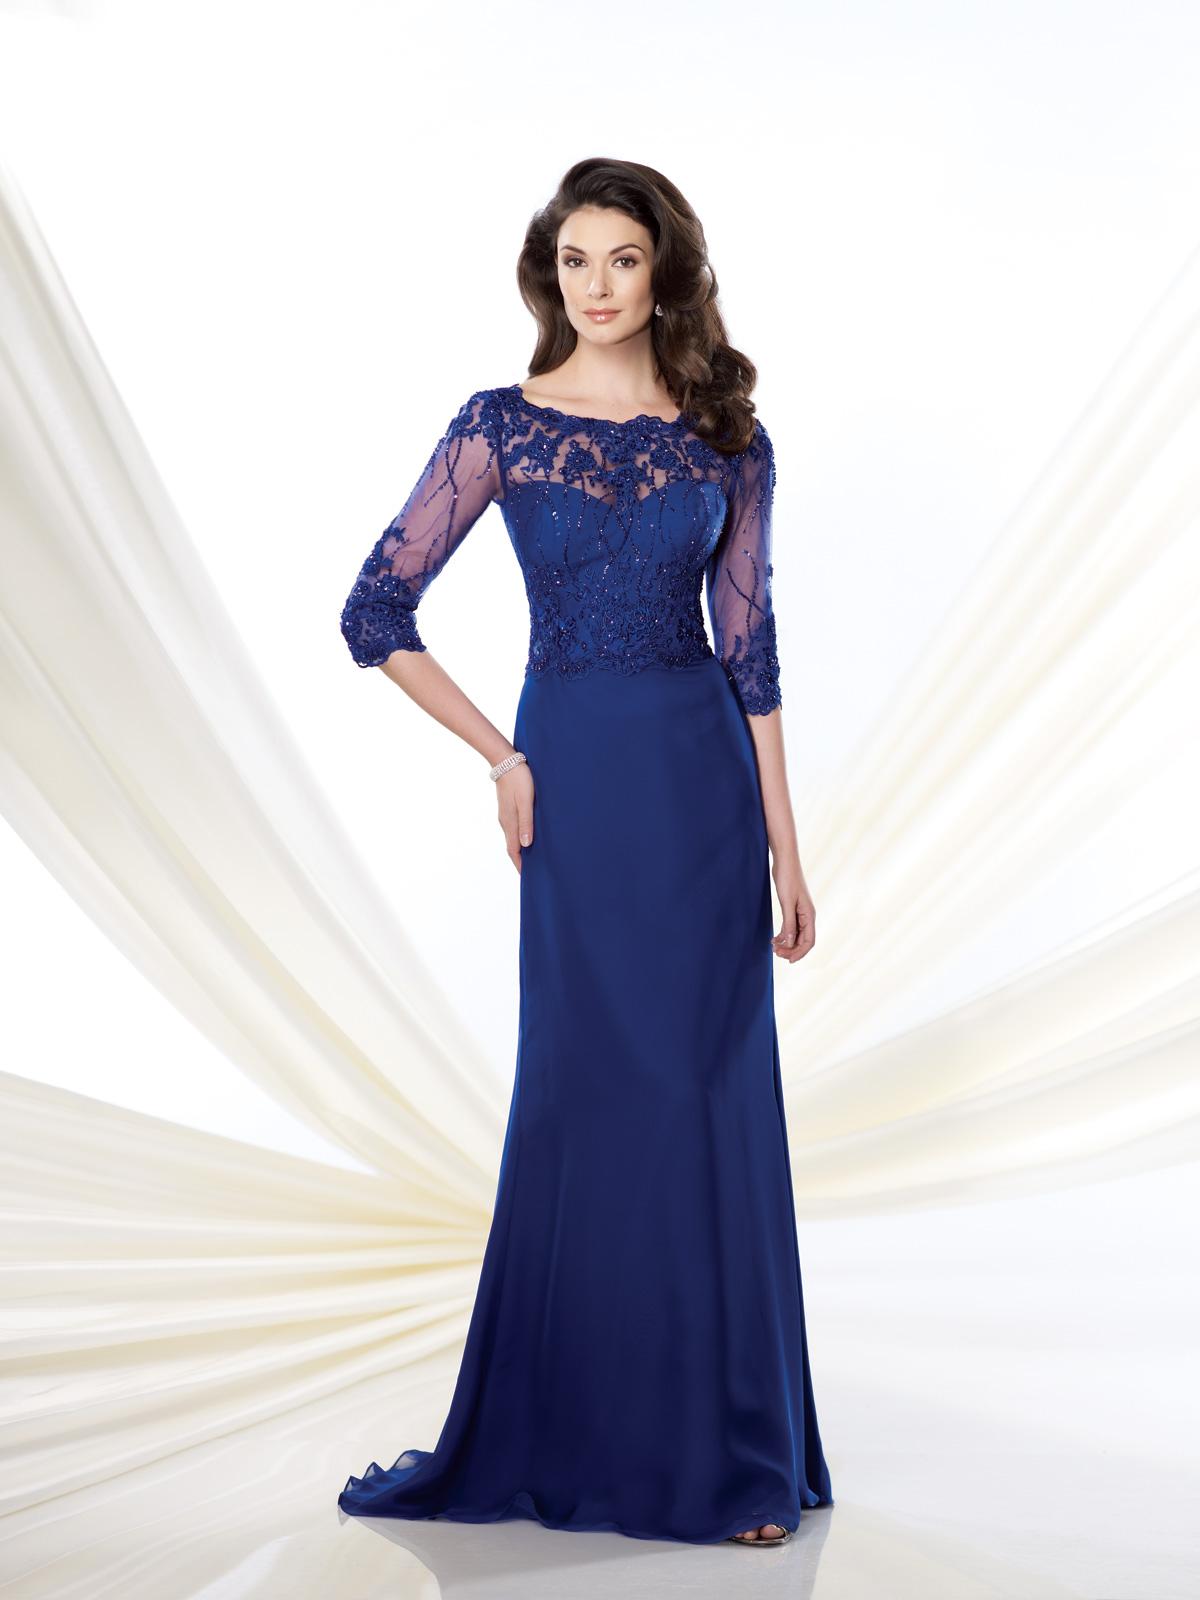 468b434a9193 214941_BACK_montage_mother_evening_dress_ottawa_store ·  214941_BACK_montage_mother_evening_dress_ottawa_store